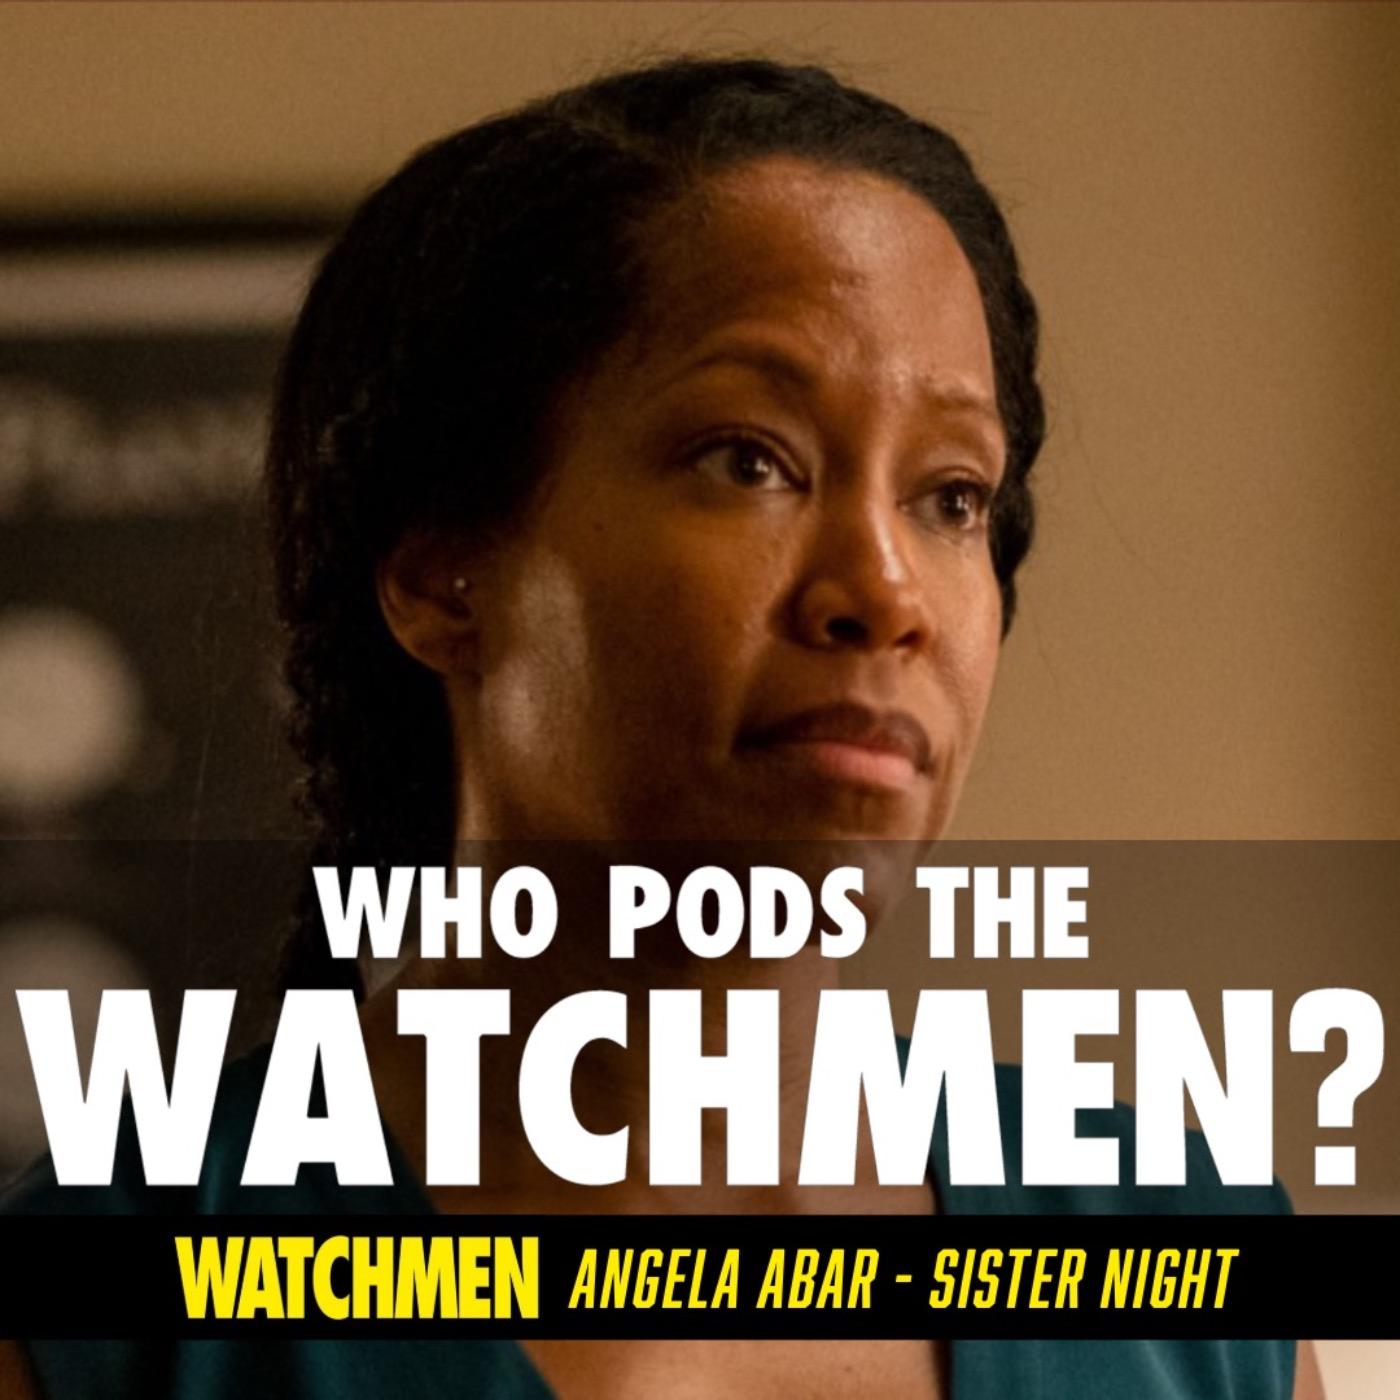 Watchmen Angela Abar/Sister Night Character Study